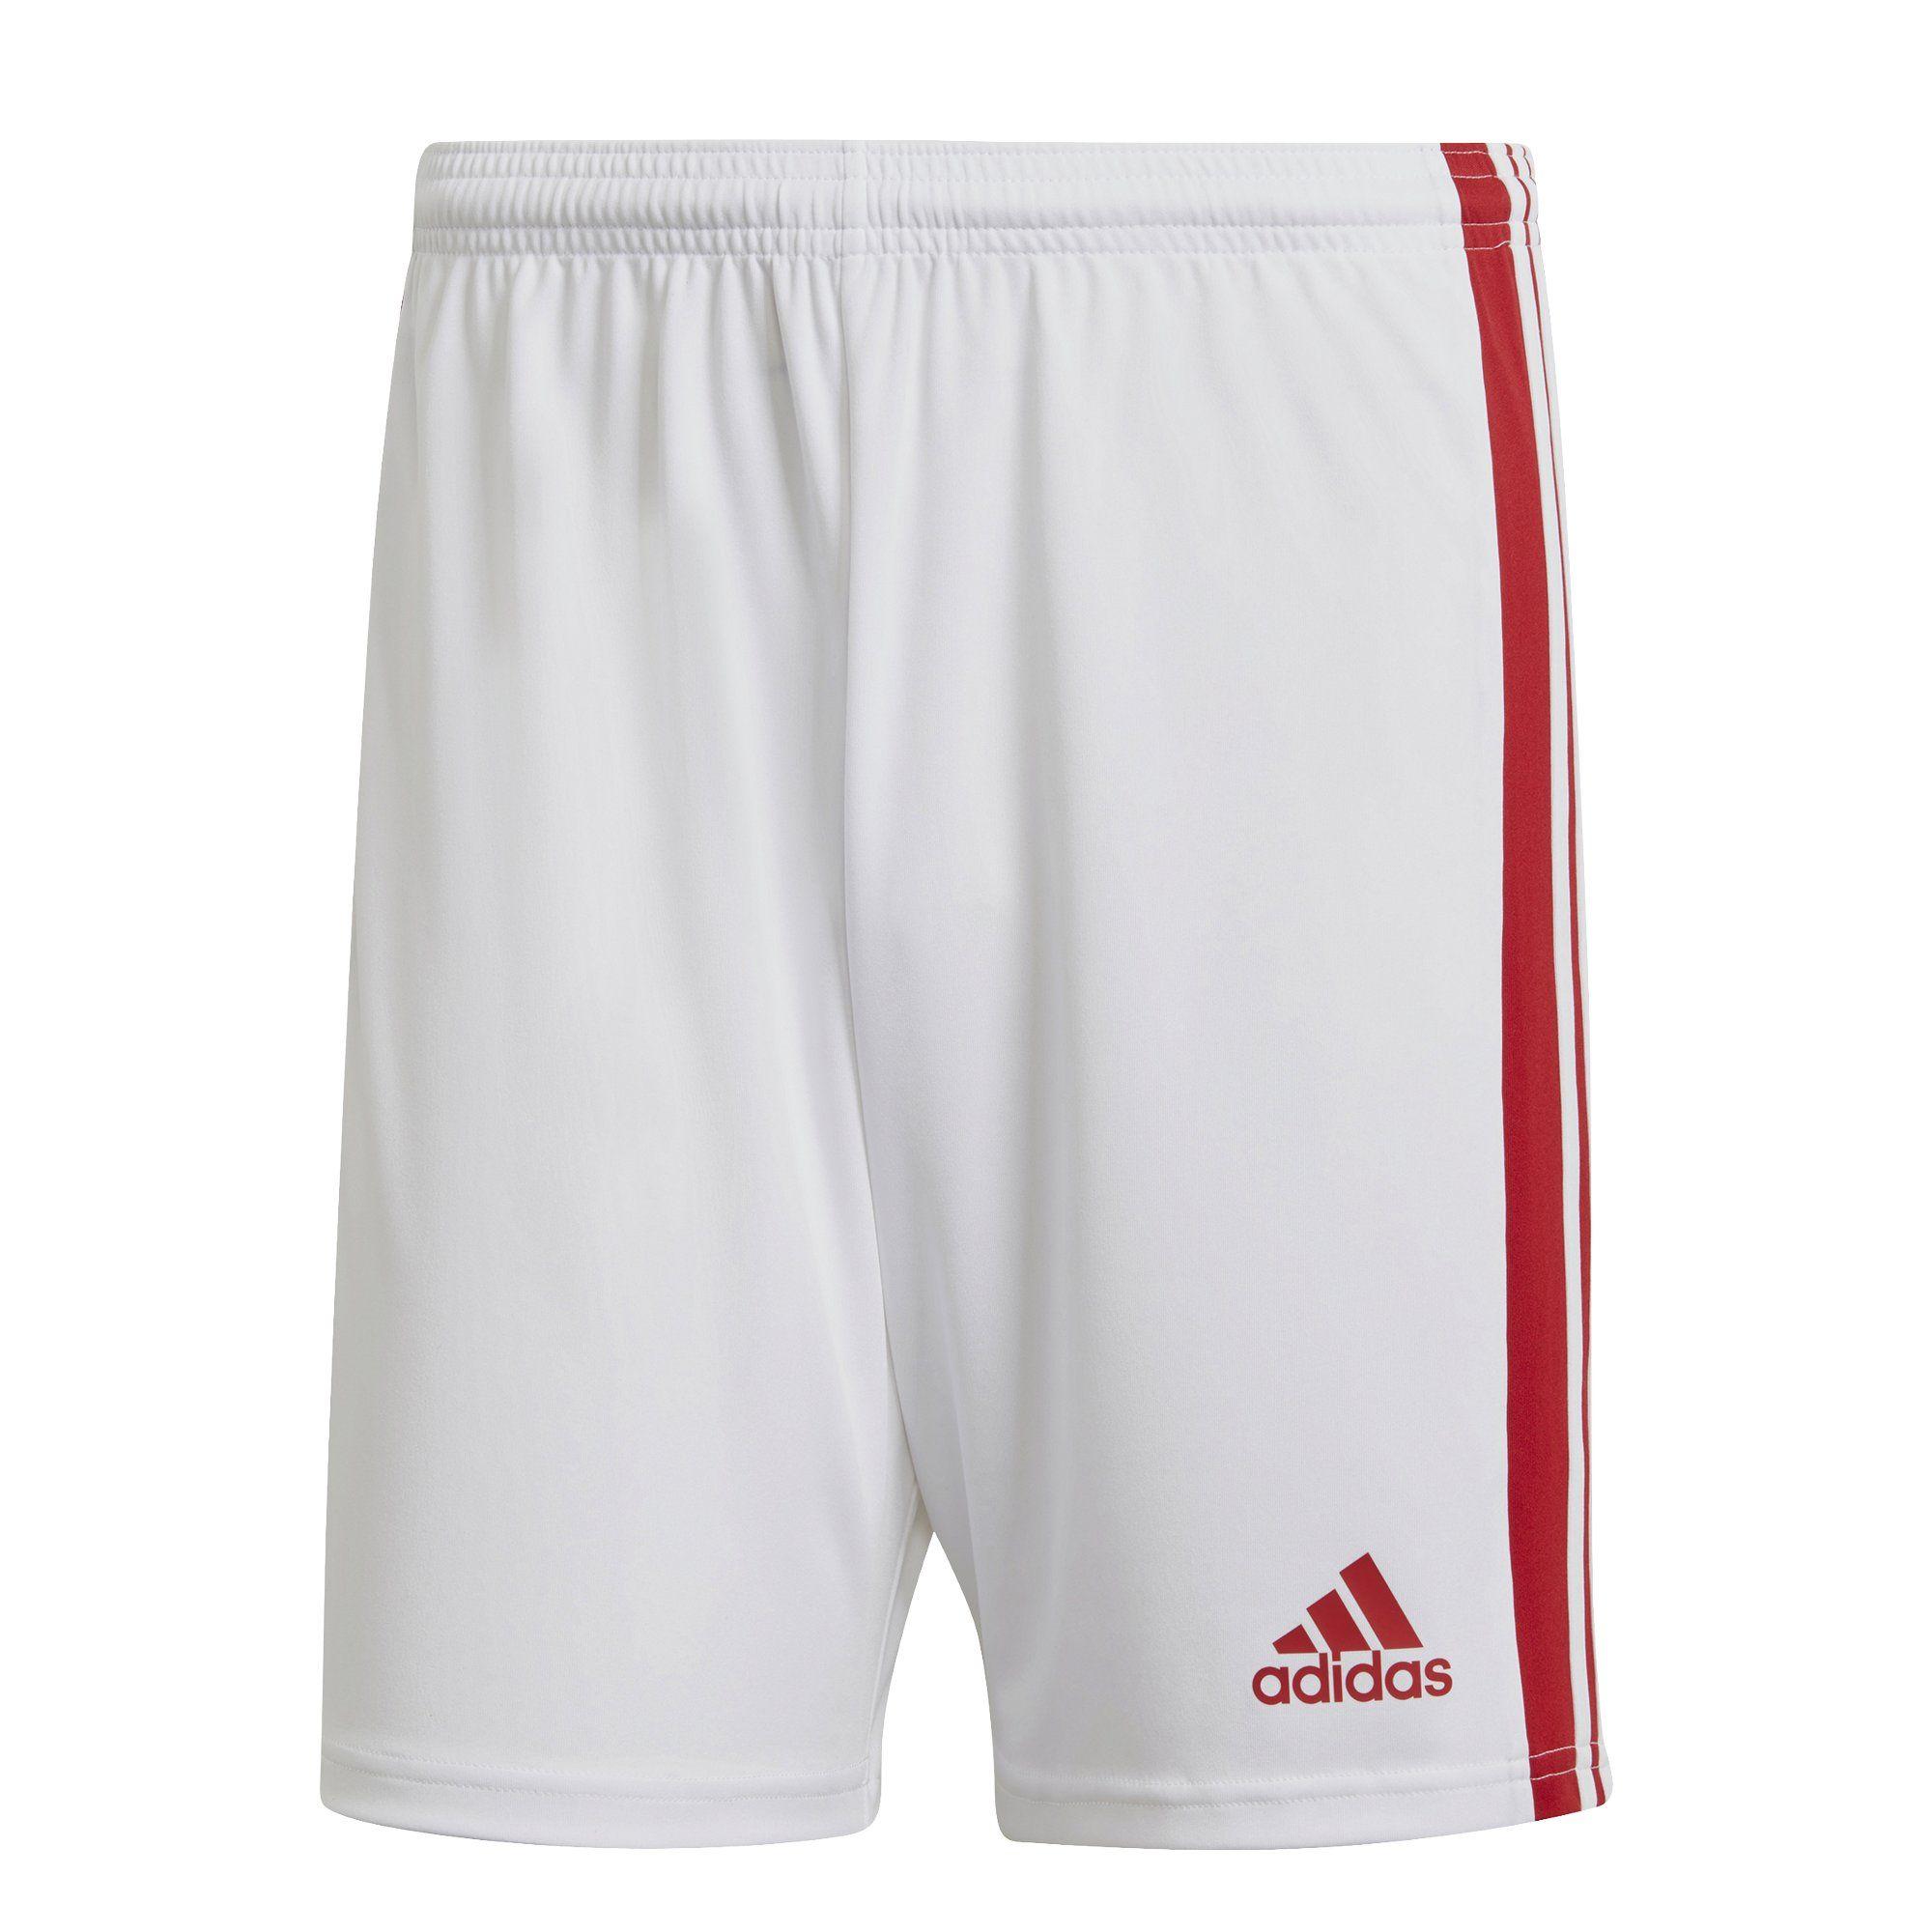 adidas Squadra 21 Voetbalbroekje Wit Rood